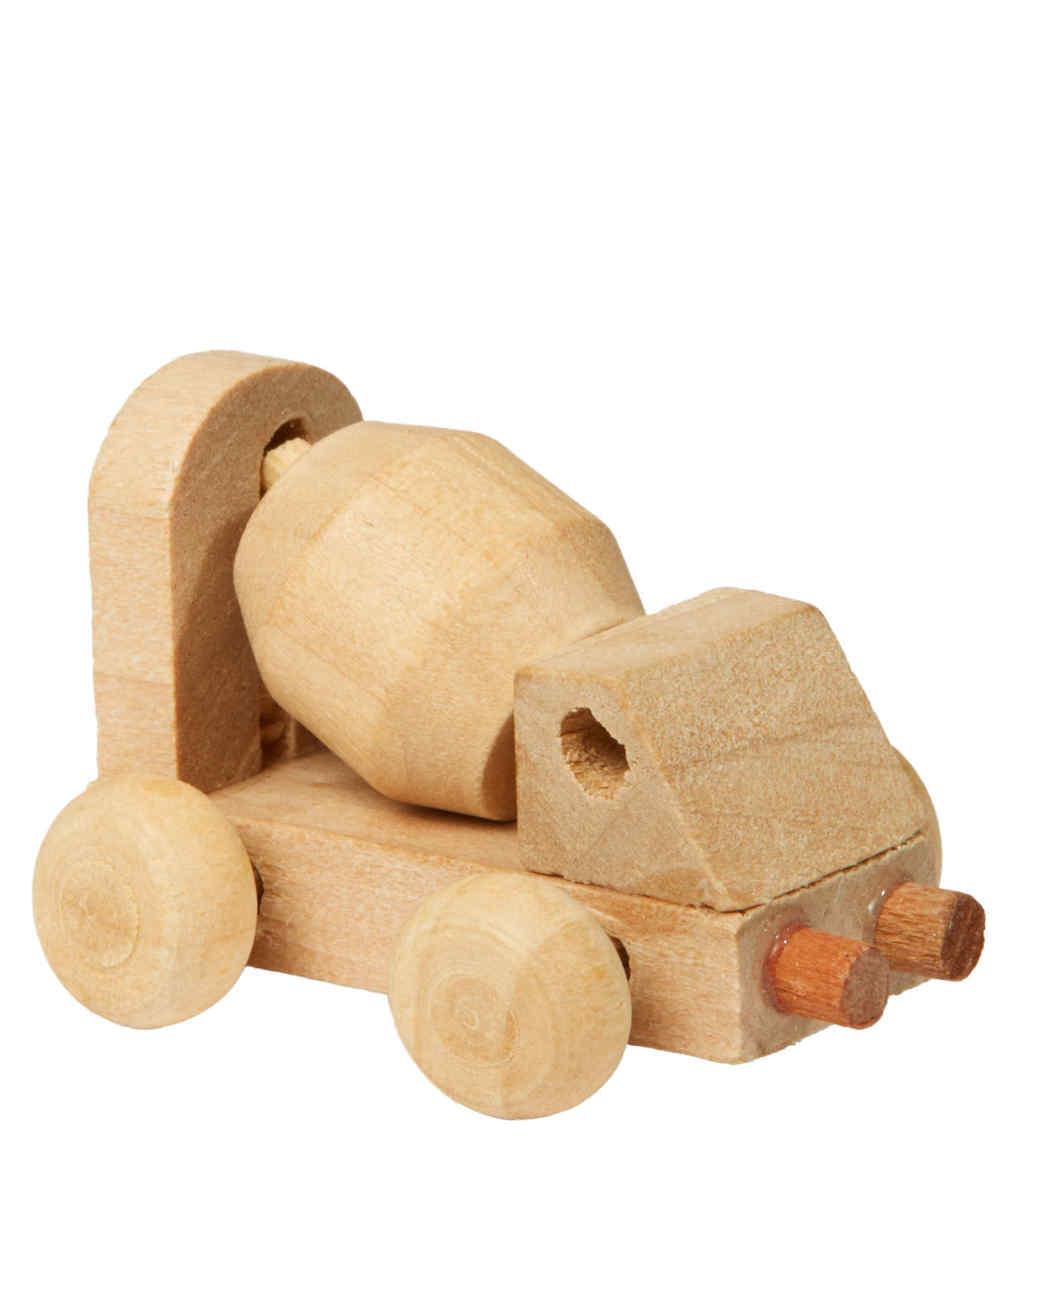 wooden dump truck toy